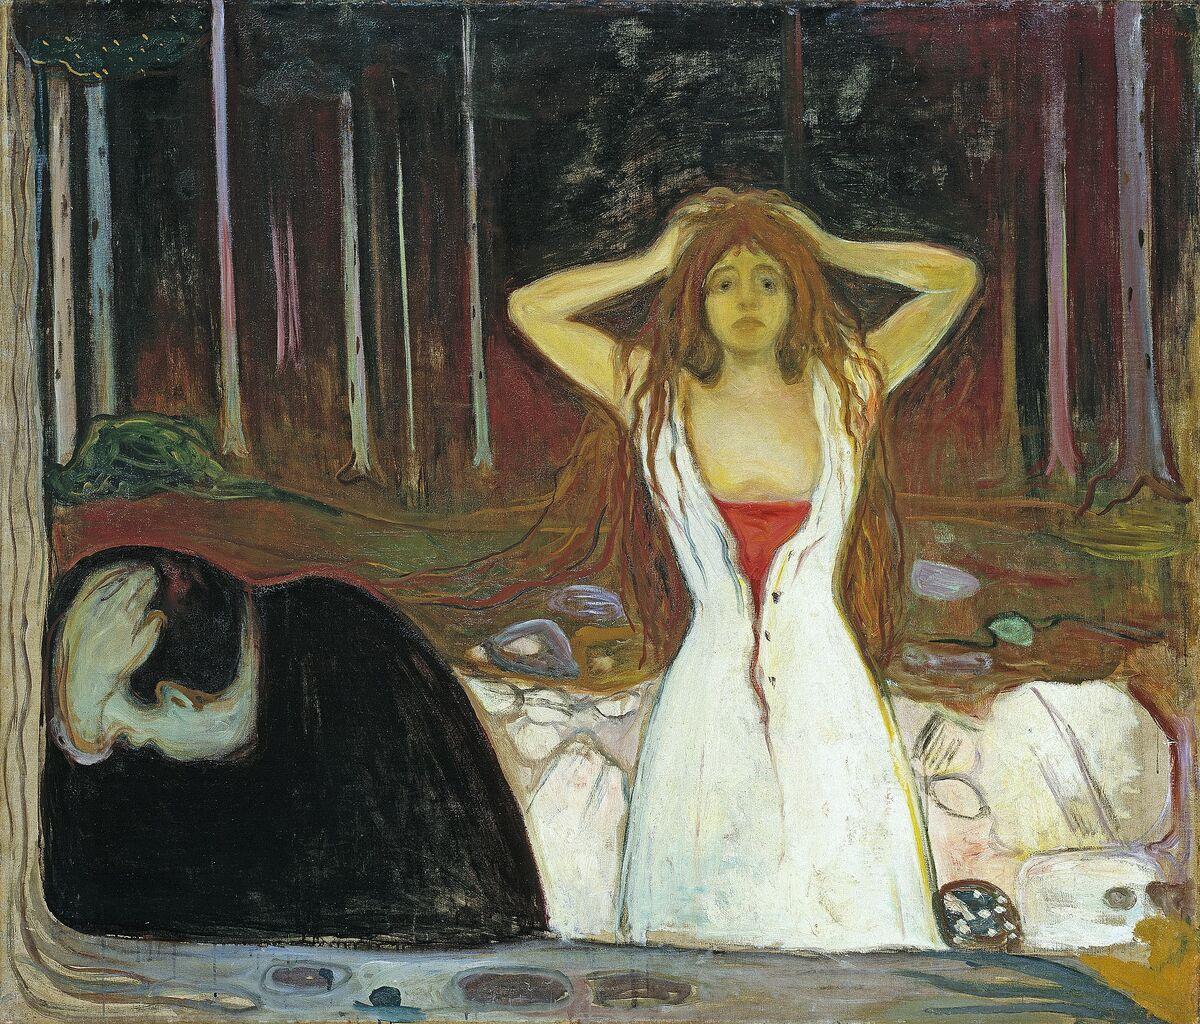 Edvard Munch, Ashes, 1895. Image via Wikimedia Commons.